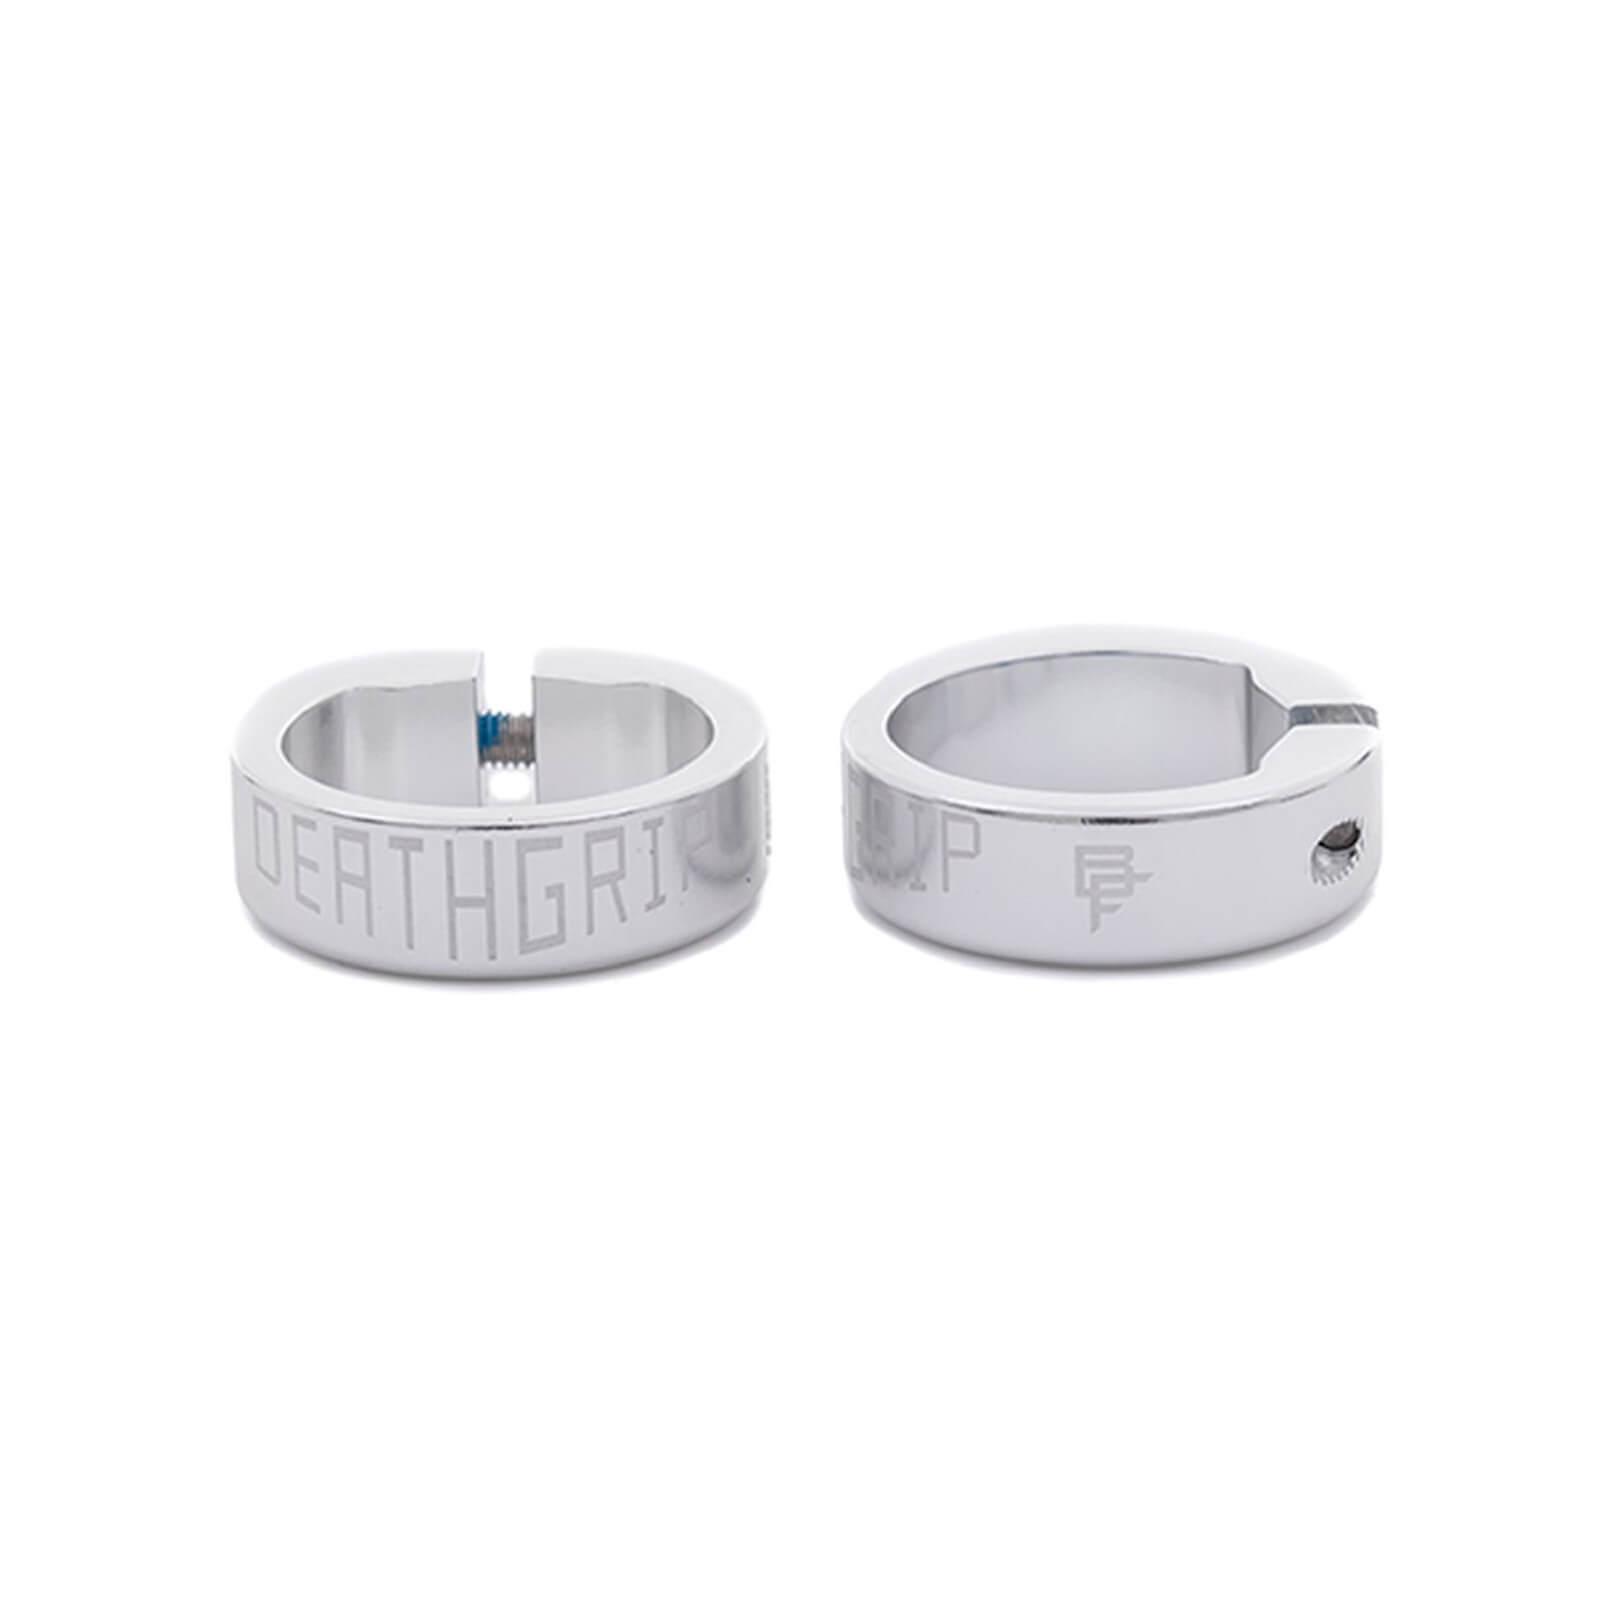 DMR Deathgrip Collar - Silver